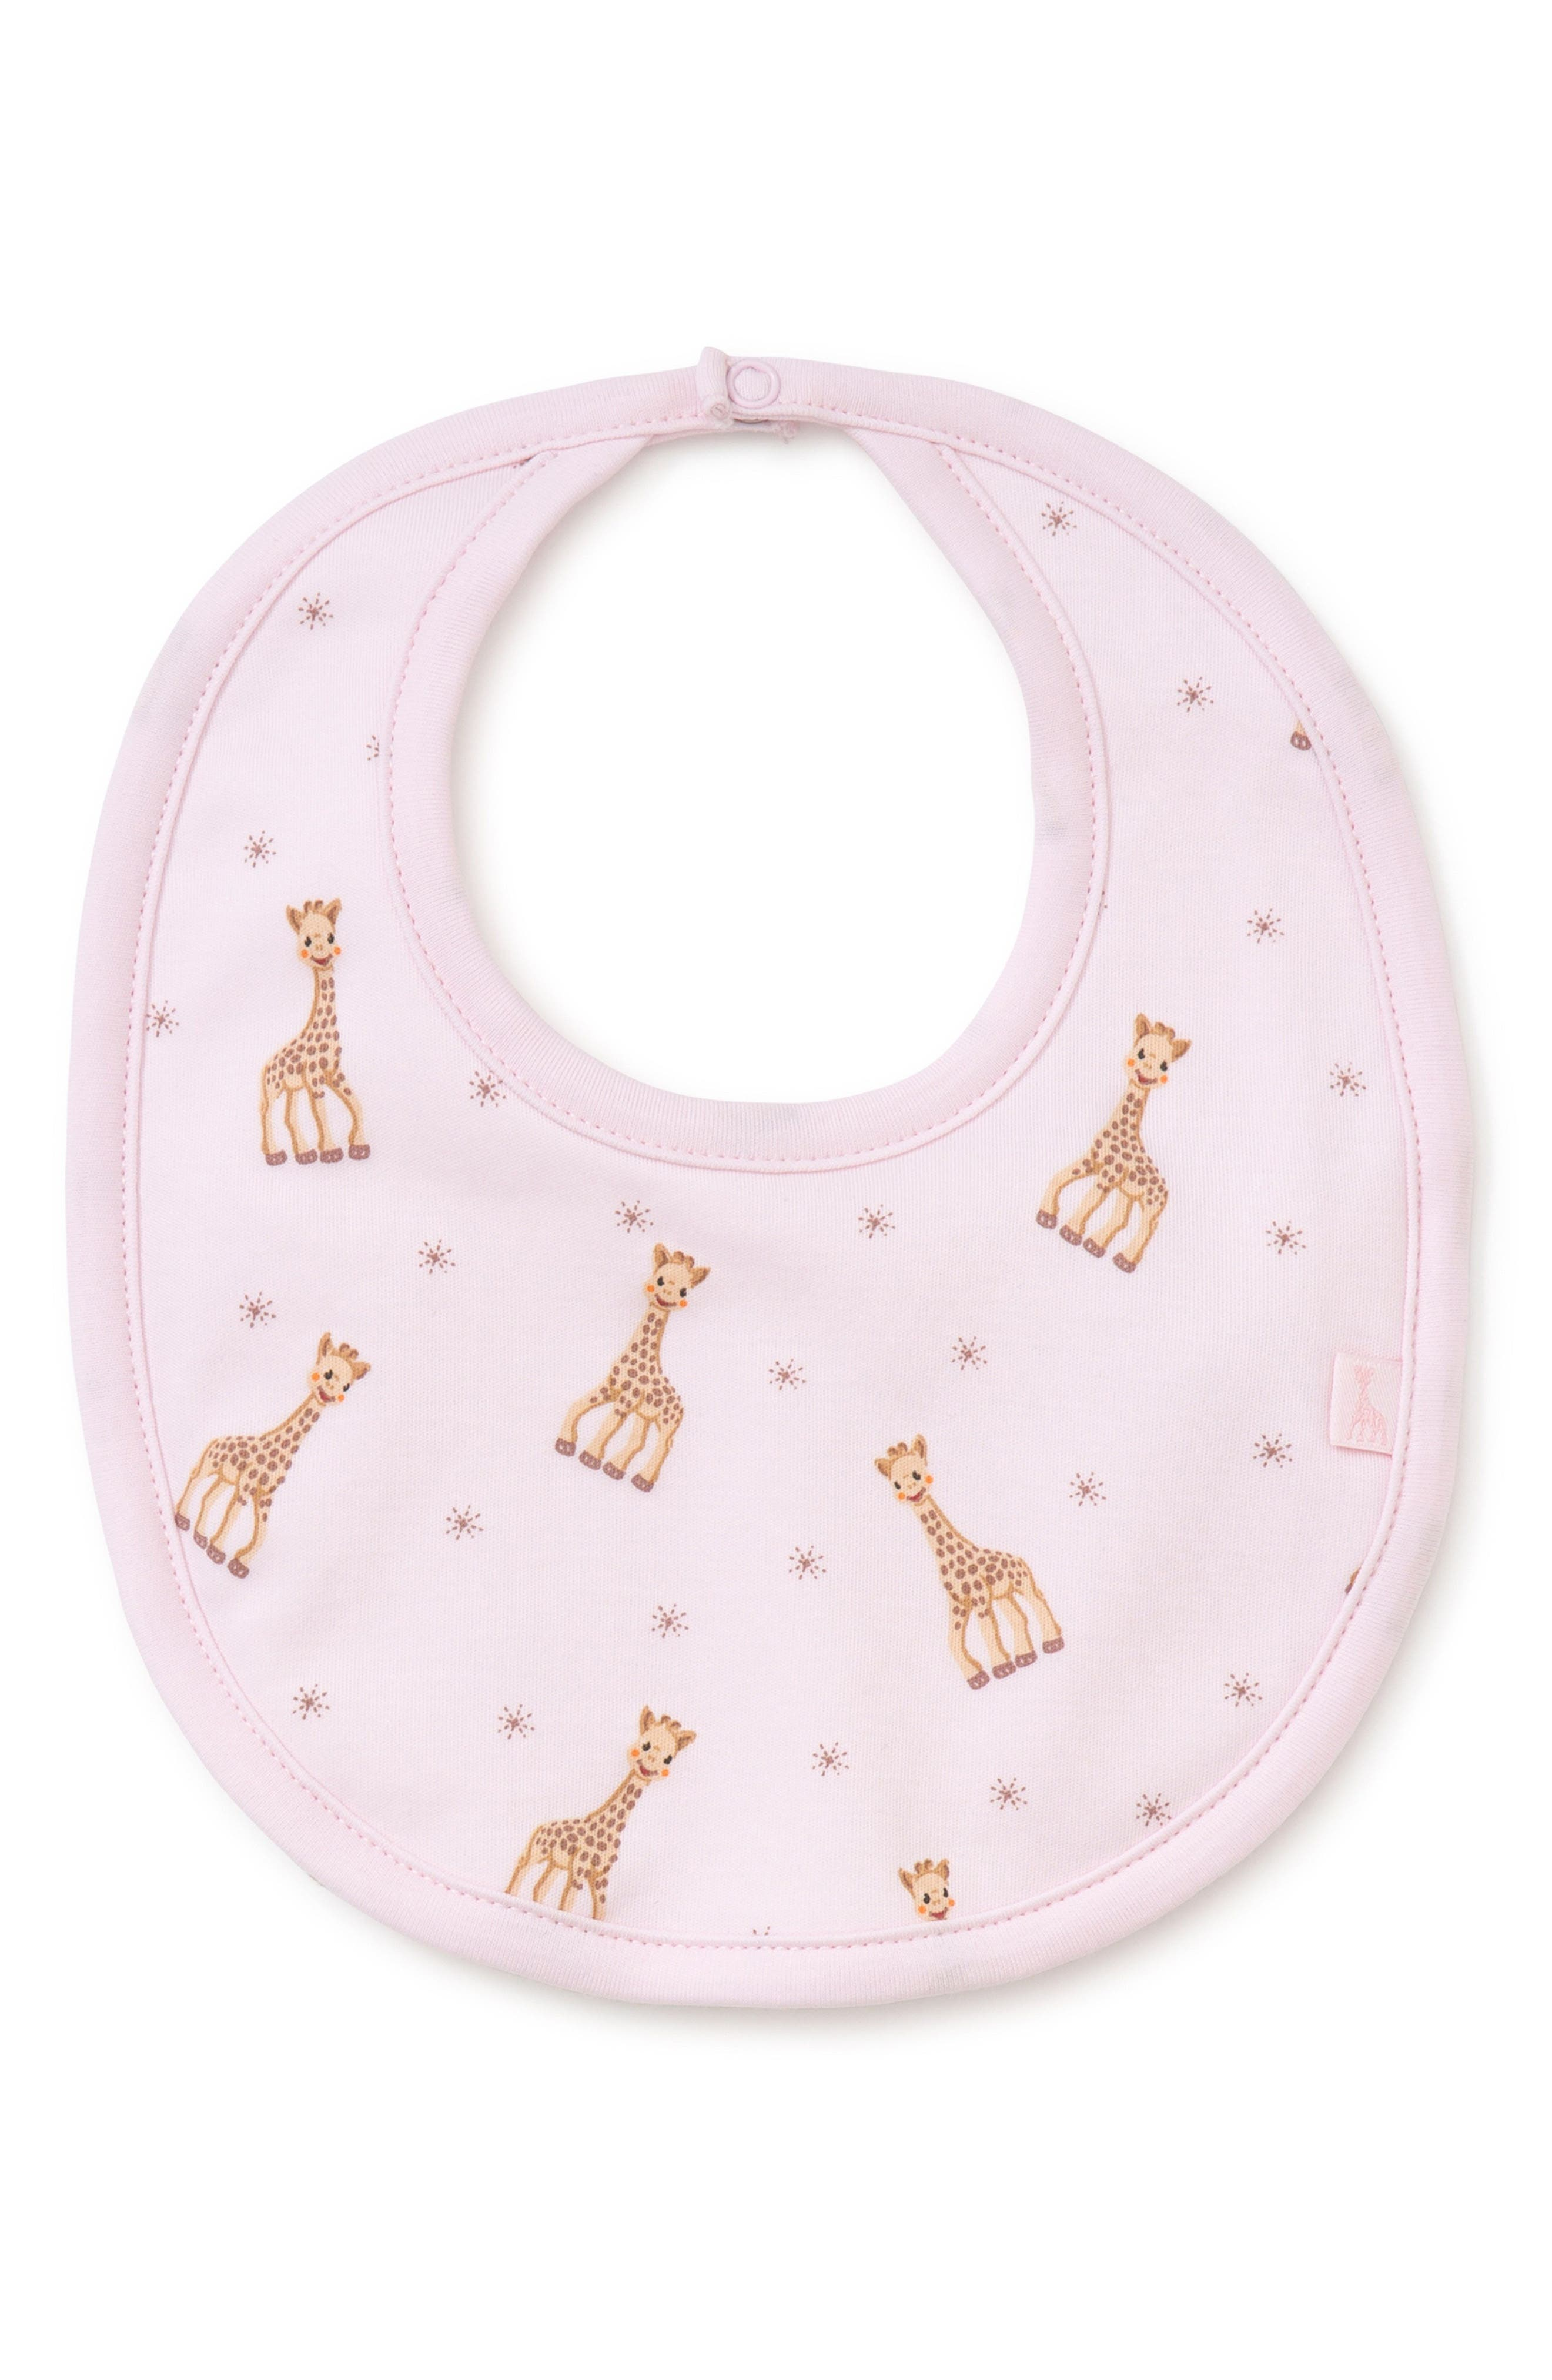 x Sophie la Girafe Bib,                             Main thumbnail 1, color,                             Pink